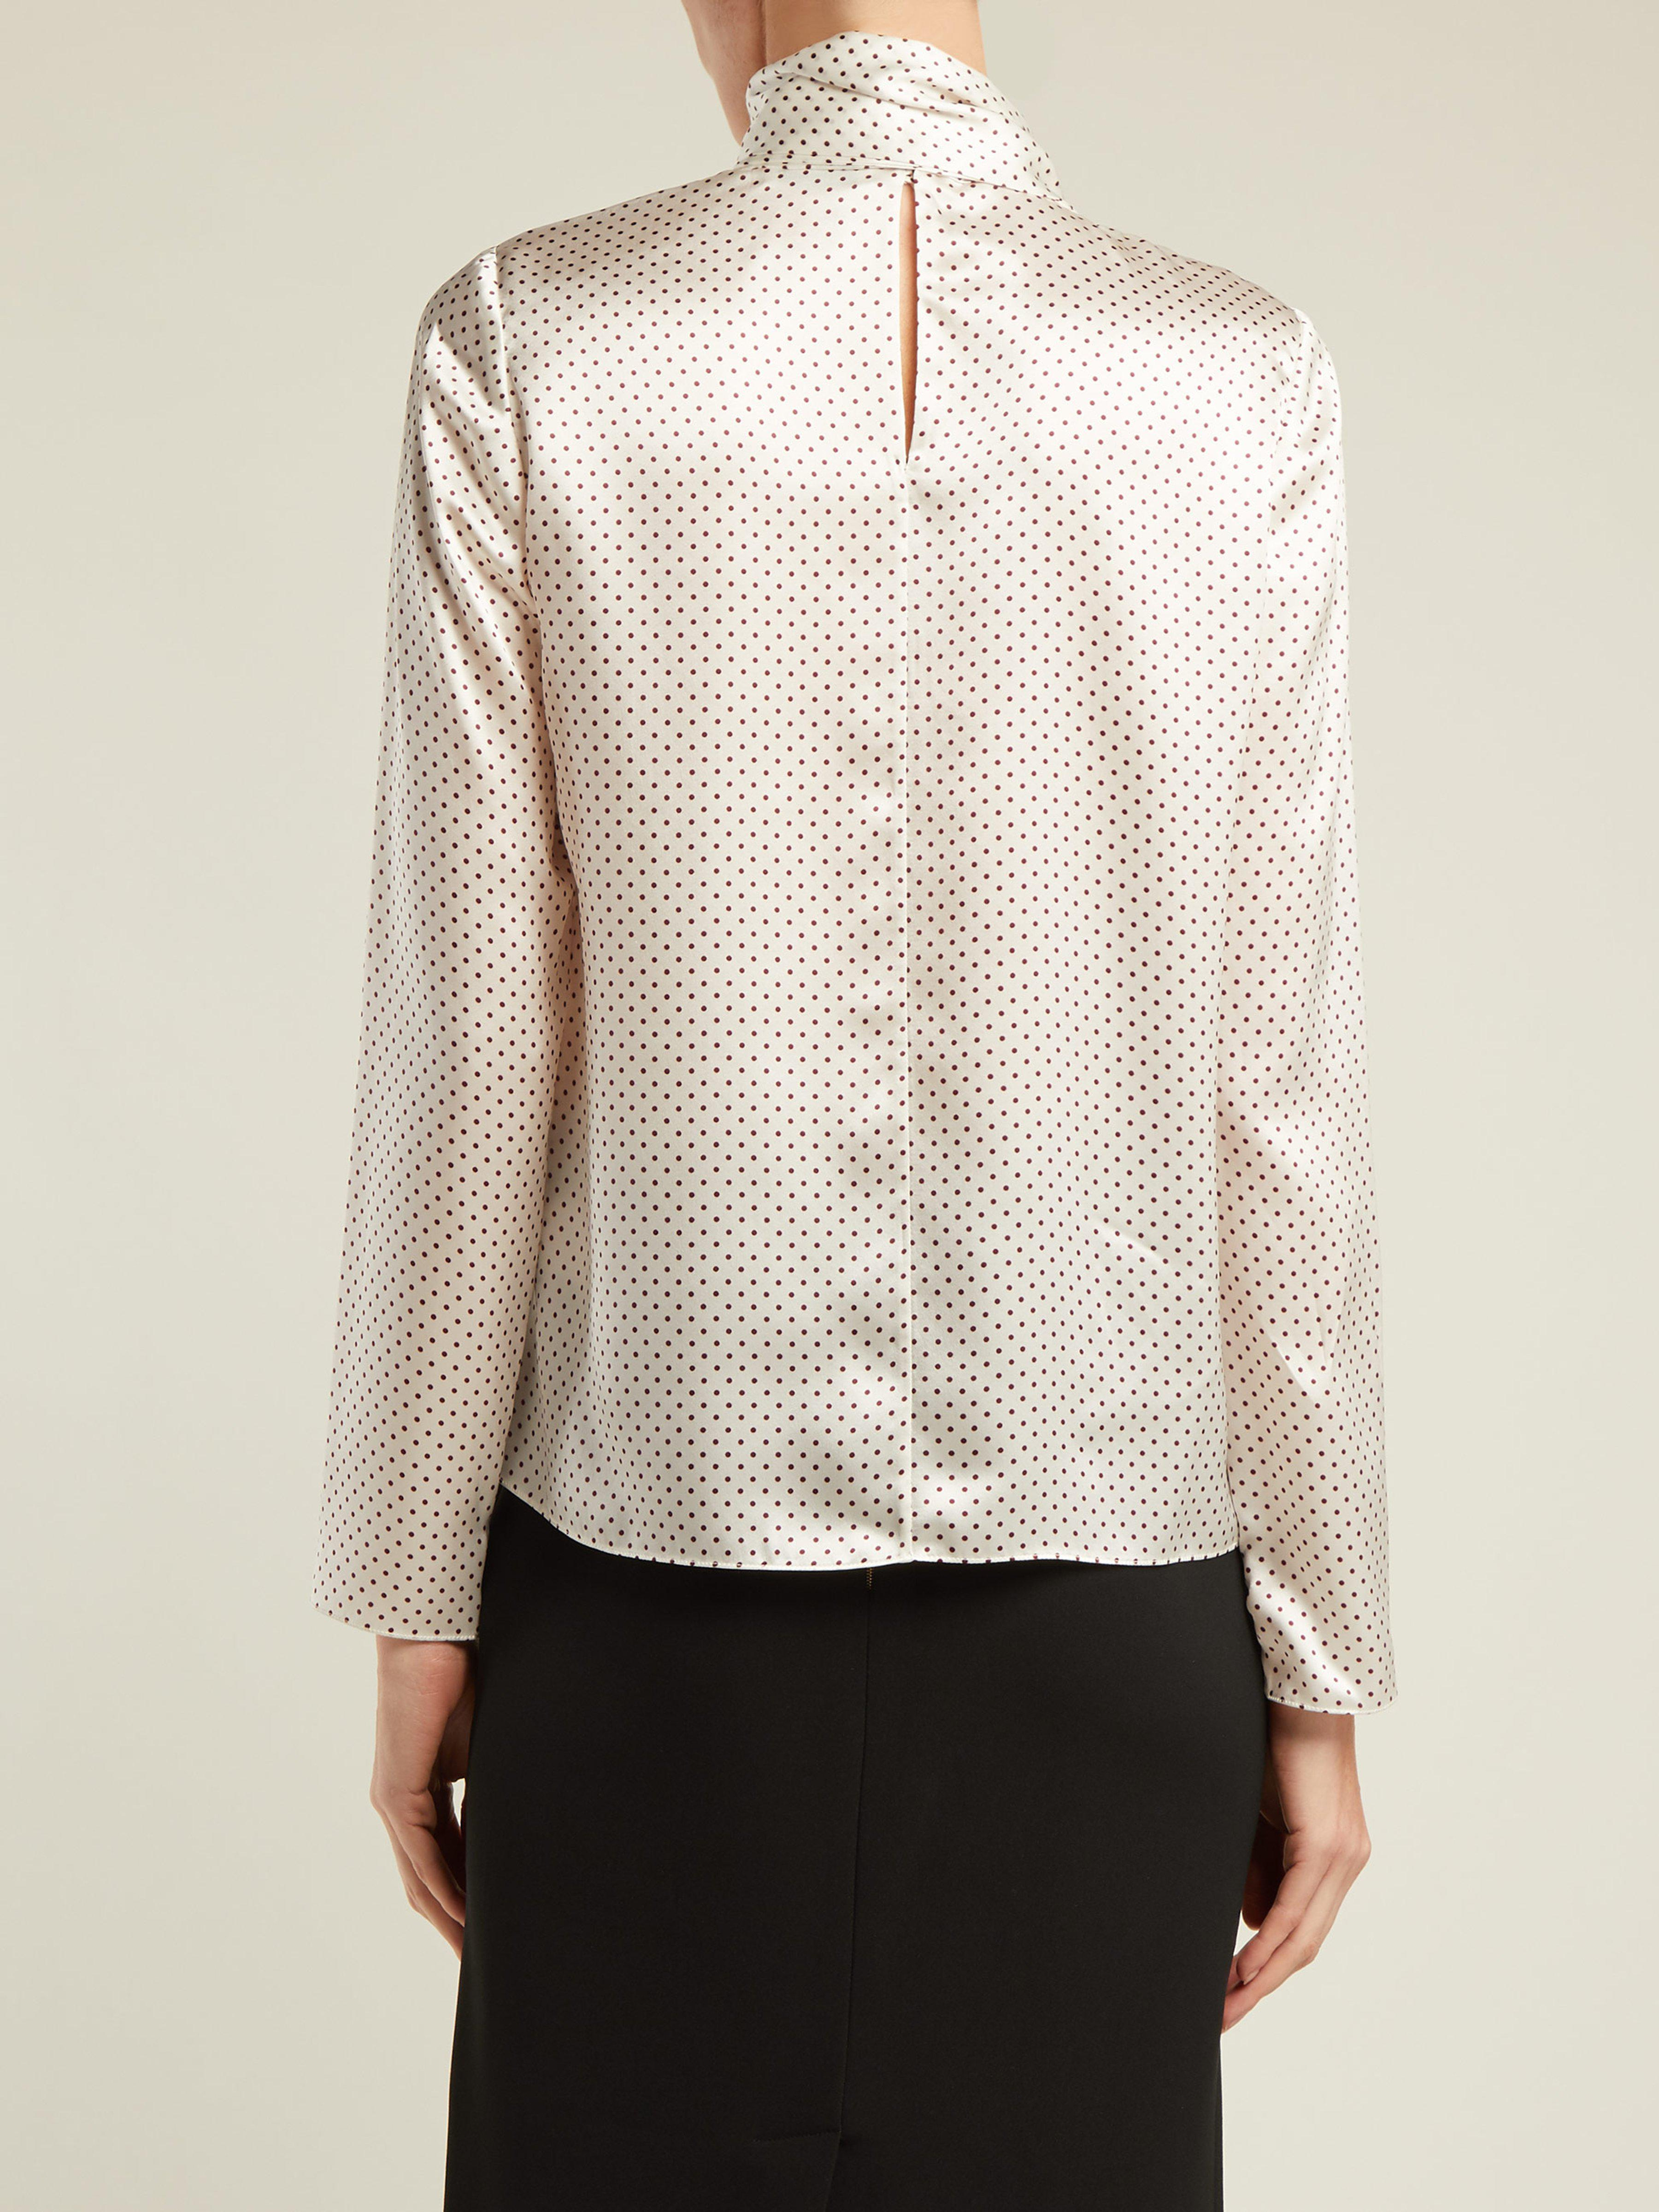 4f853dedac670 Erdem Yvonna Polka Dot Print Silk Blouse in White - Lyst